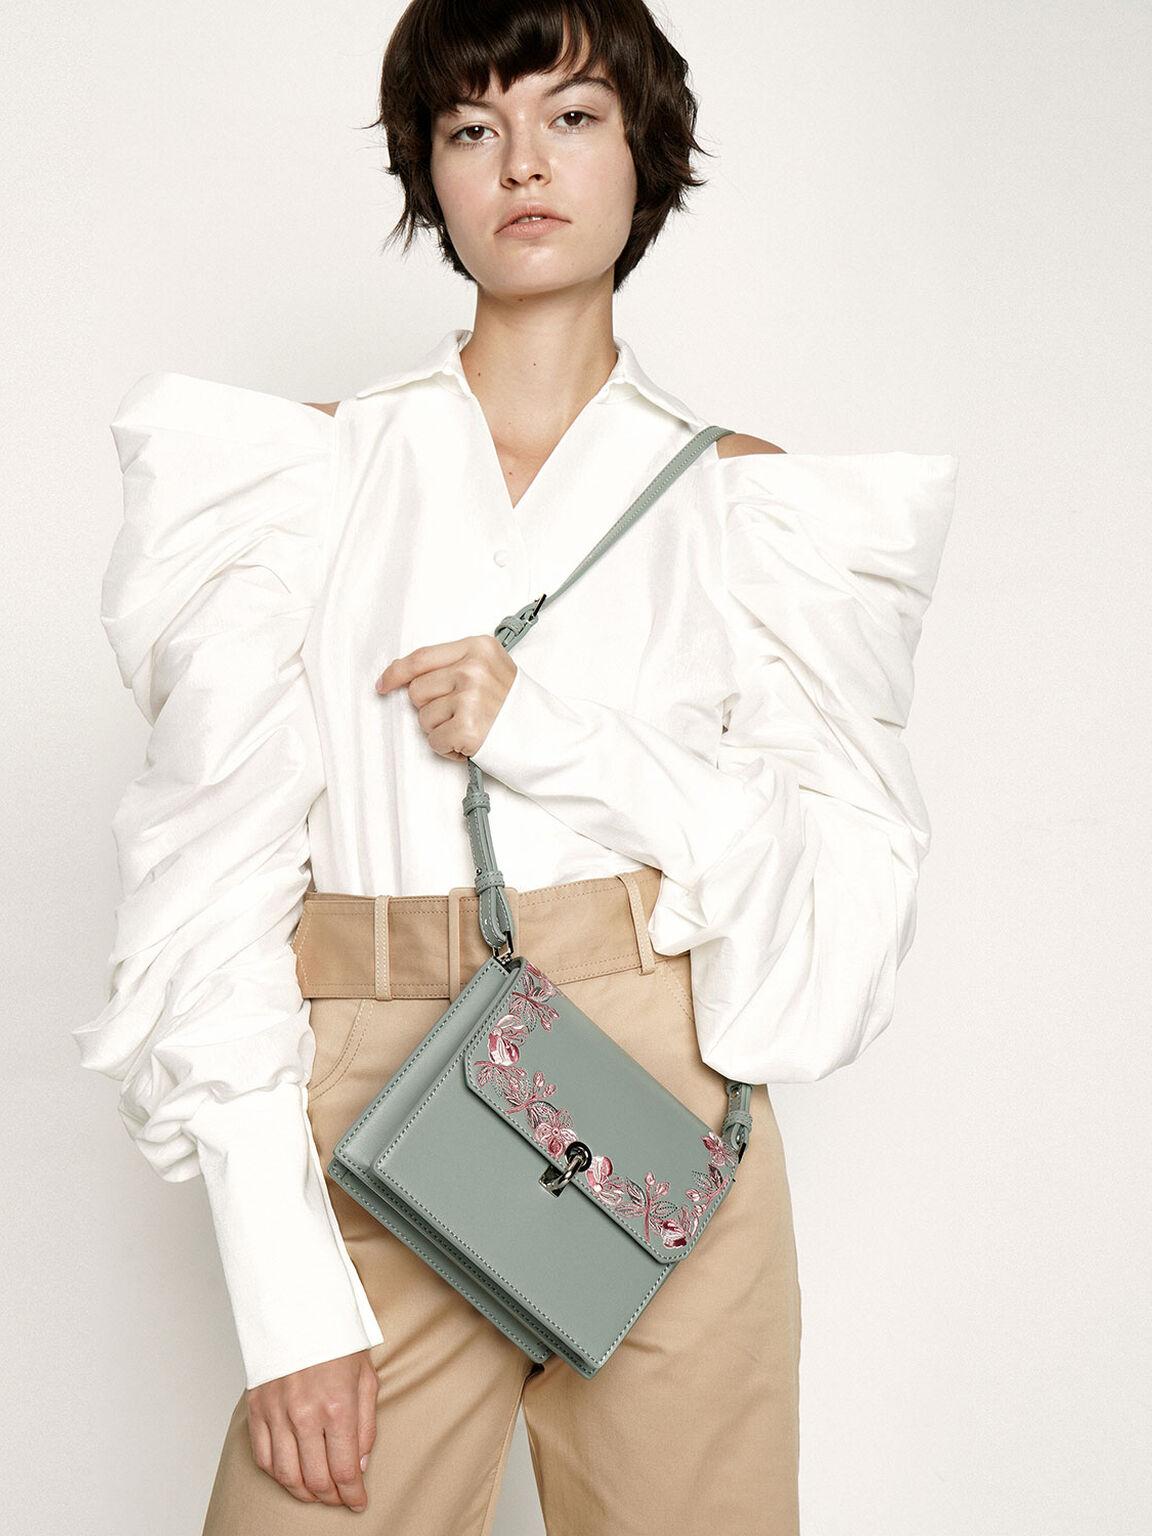 Floral Embroidered Turn Lock Bag, Green, hi-res